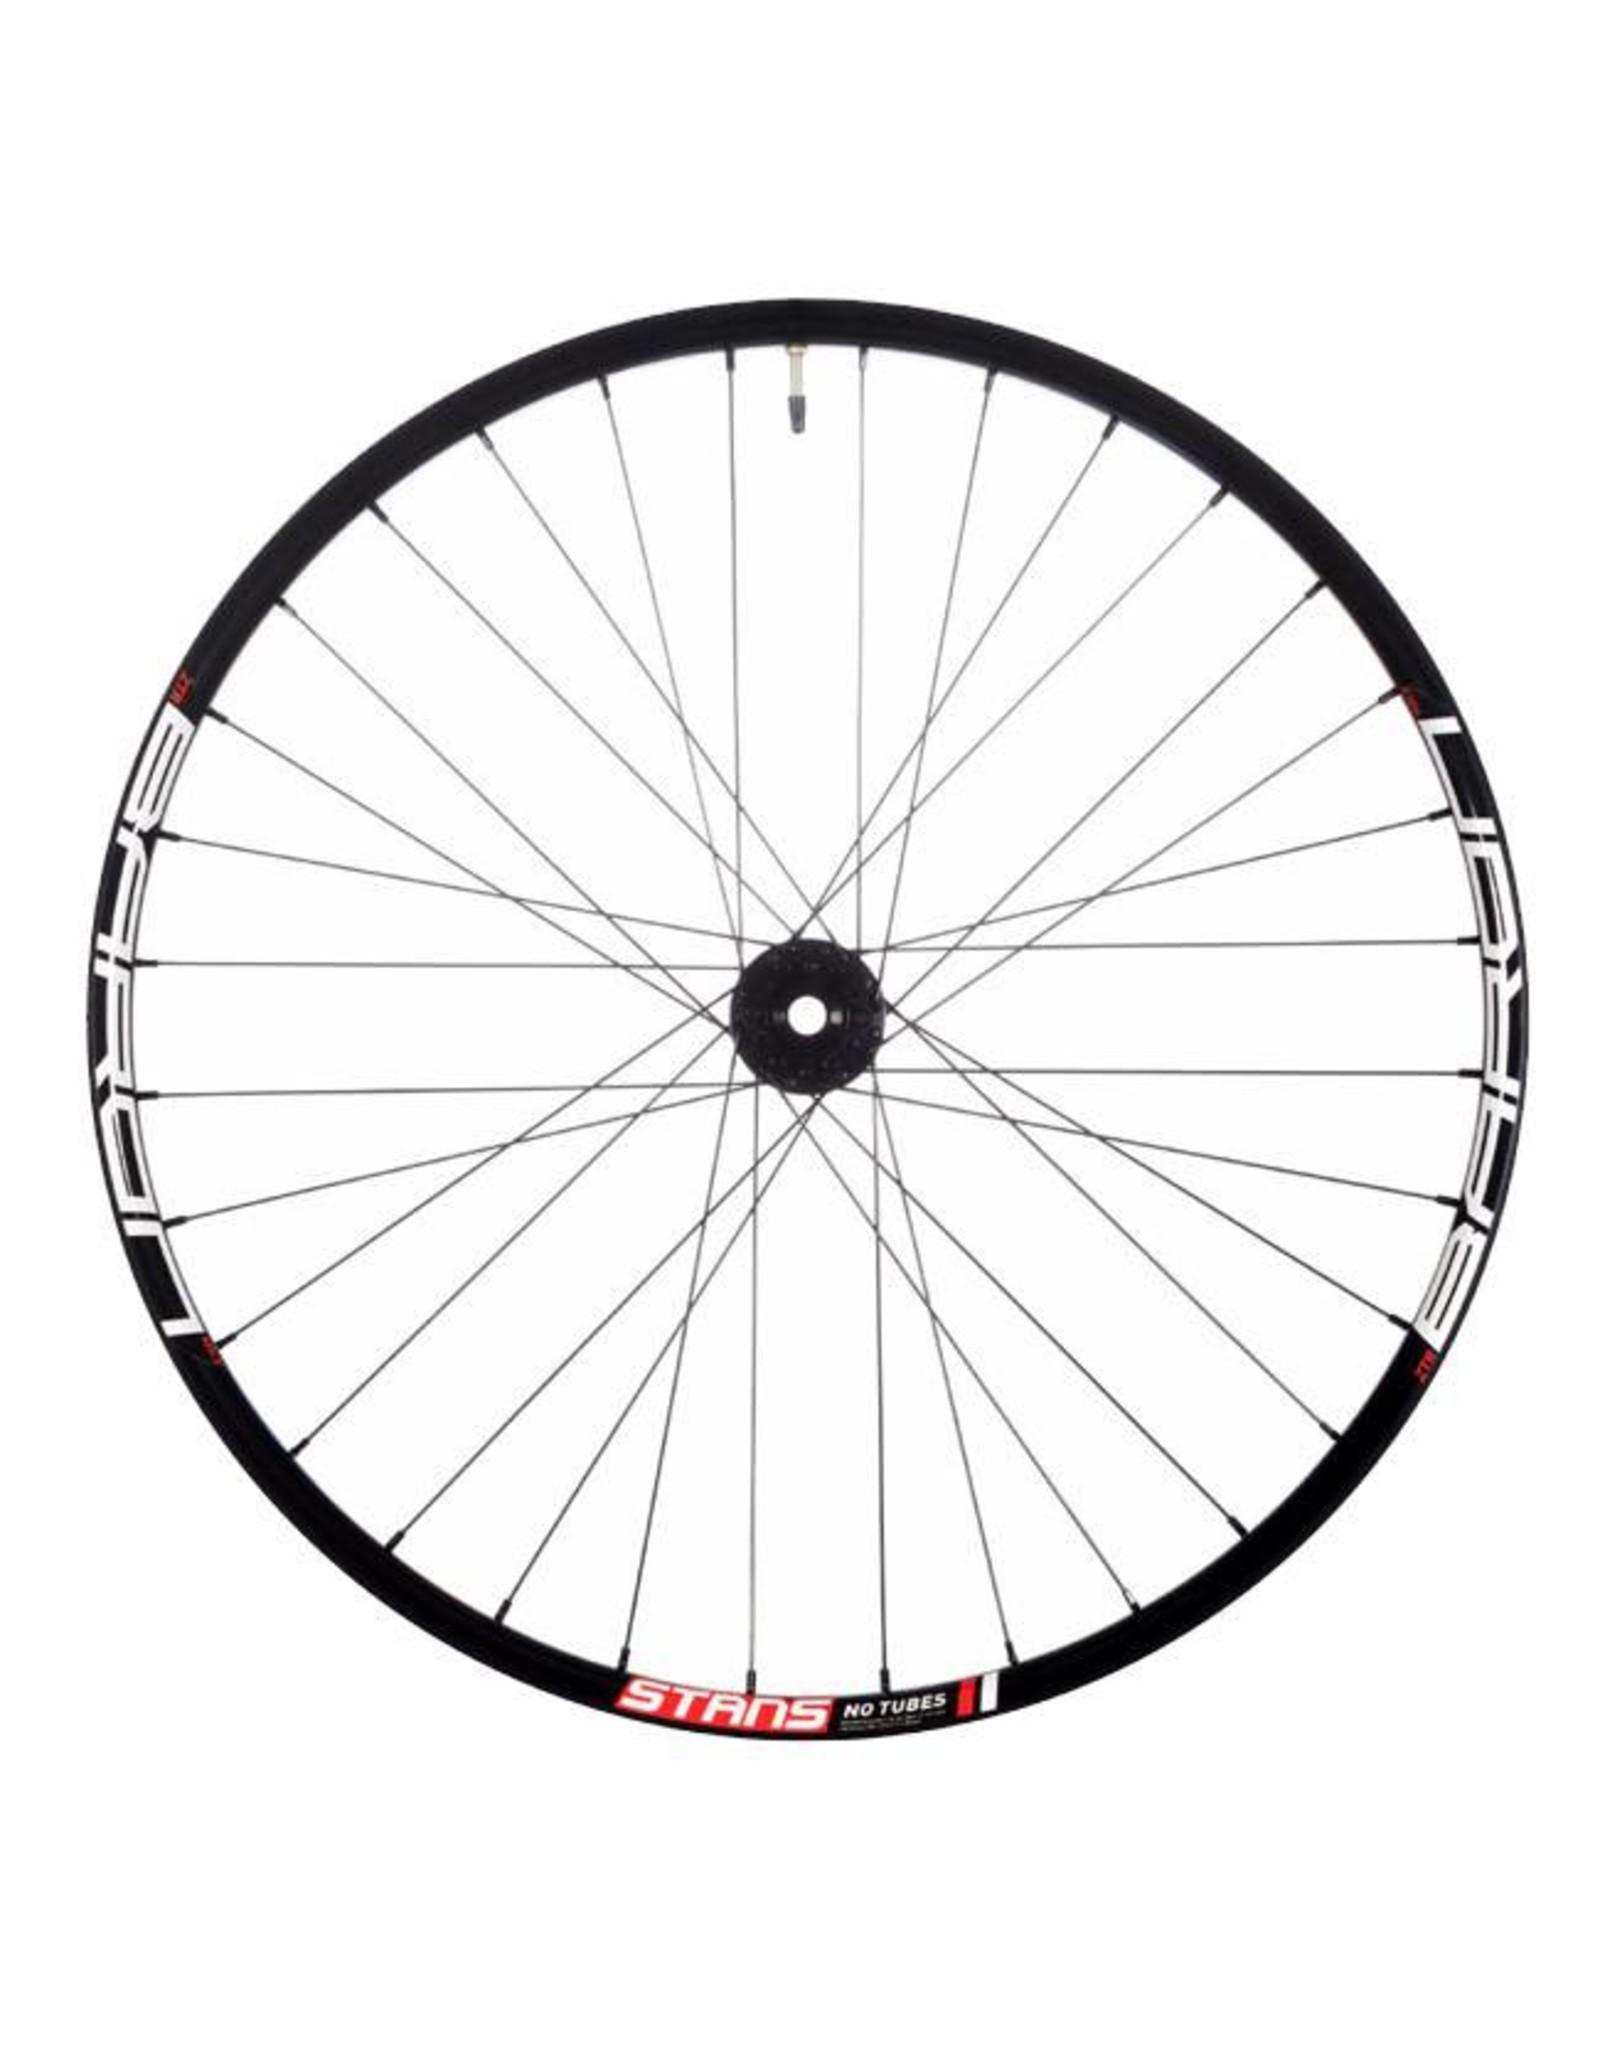 "Stan's No Tubes Stan's No Tubes Baron MK3 Rear Wheel: 29"" Alloy, 12 x 148mm Boost, 6- Bolt Disc, Shimano Freehub, Black"